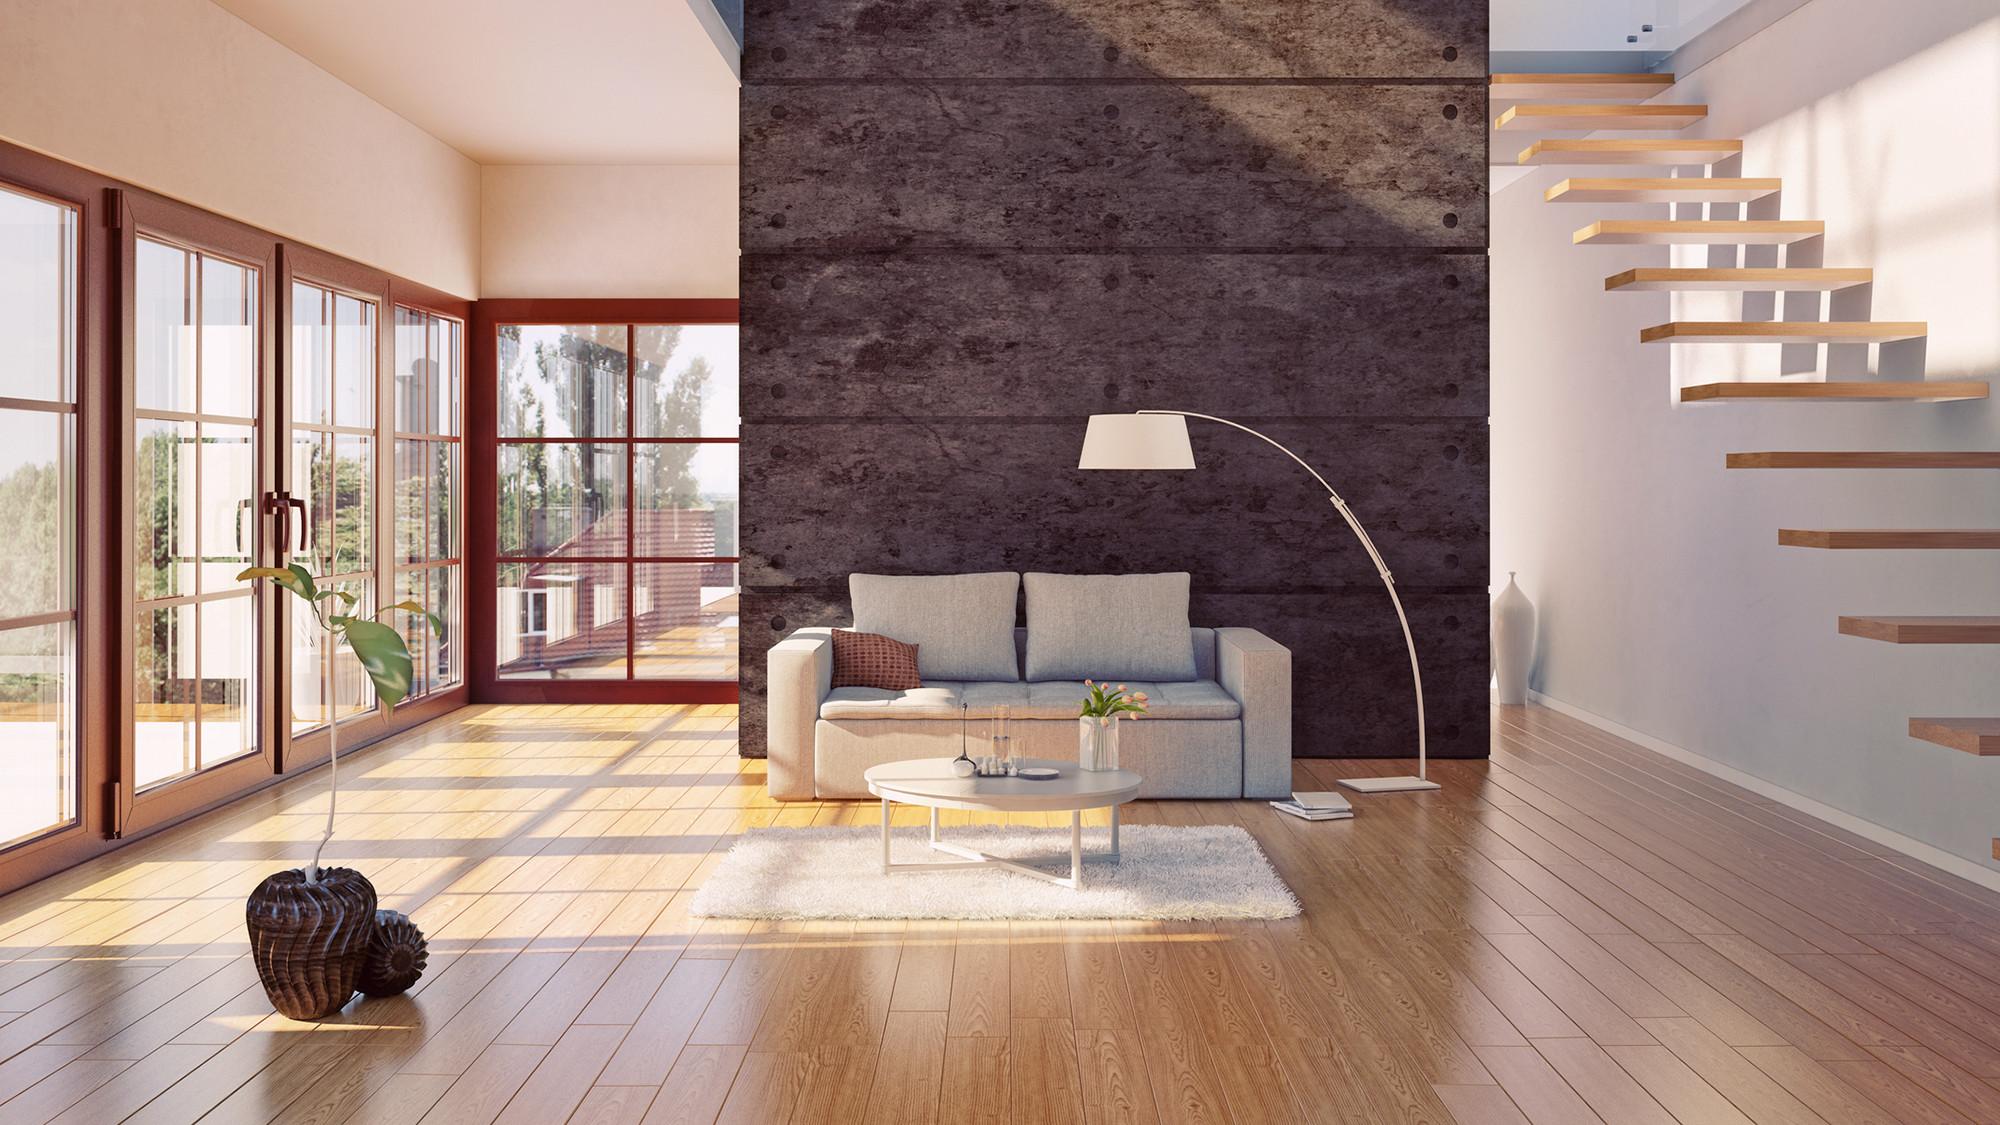 hardwood floor refinishing average cost per square foot of do hardwood floors provide the best return on investment realtor coma regarding hardwood floors investment